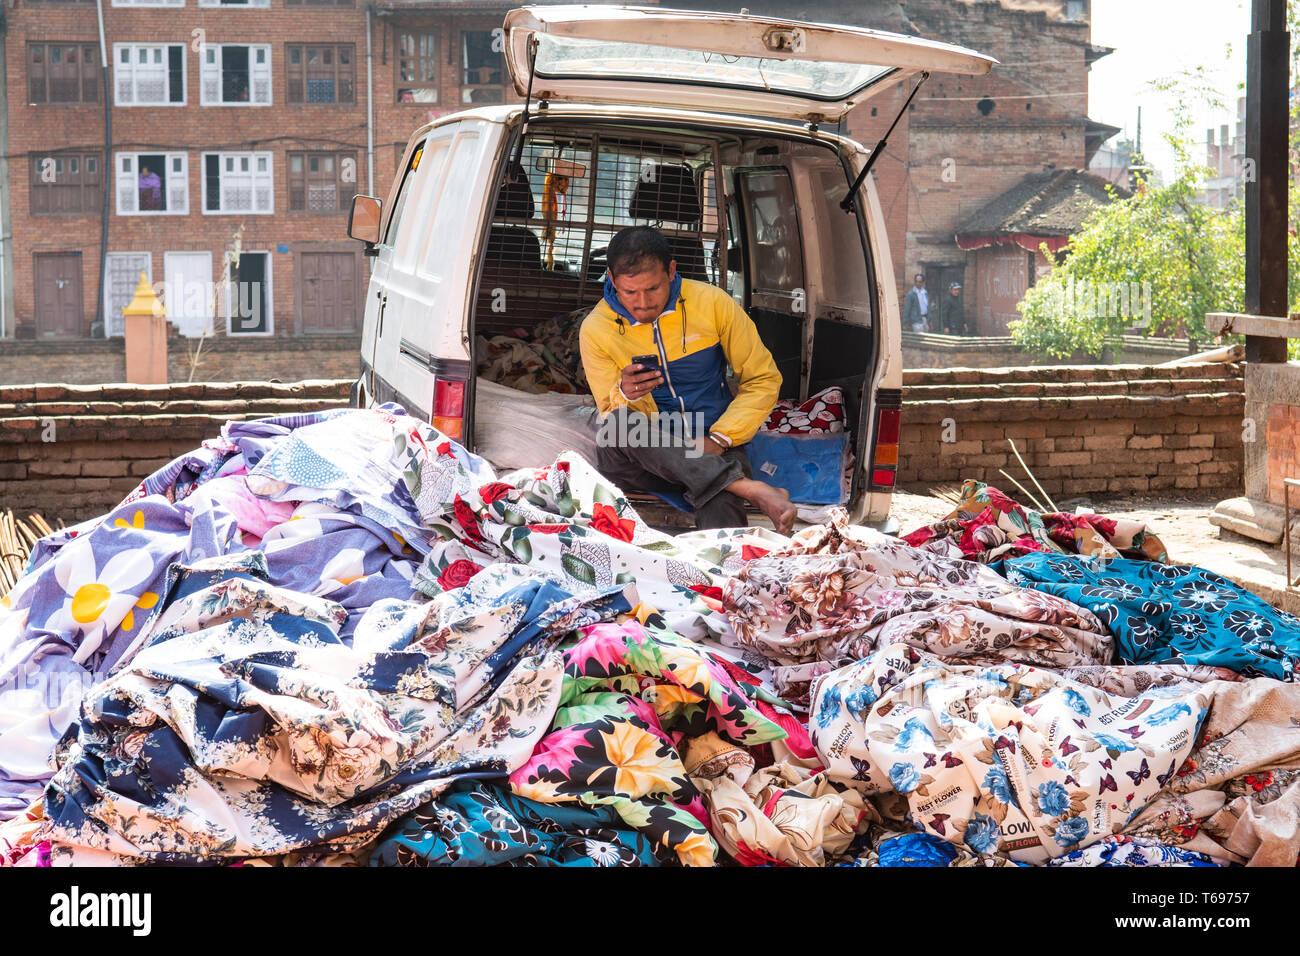 Bhaktapur, Kathmandu Valley / Nepal - April 17th, 2019 - Nepali man selling fabrics in the city. Stock Photo